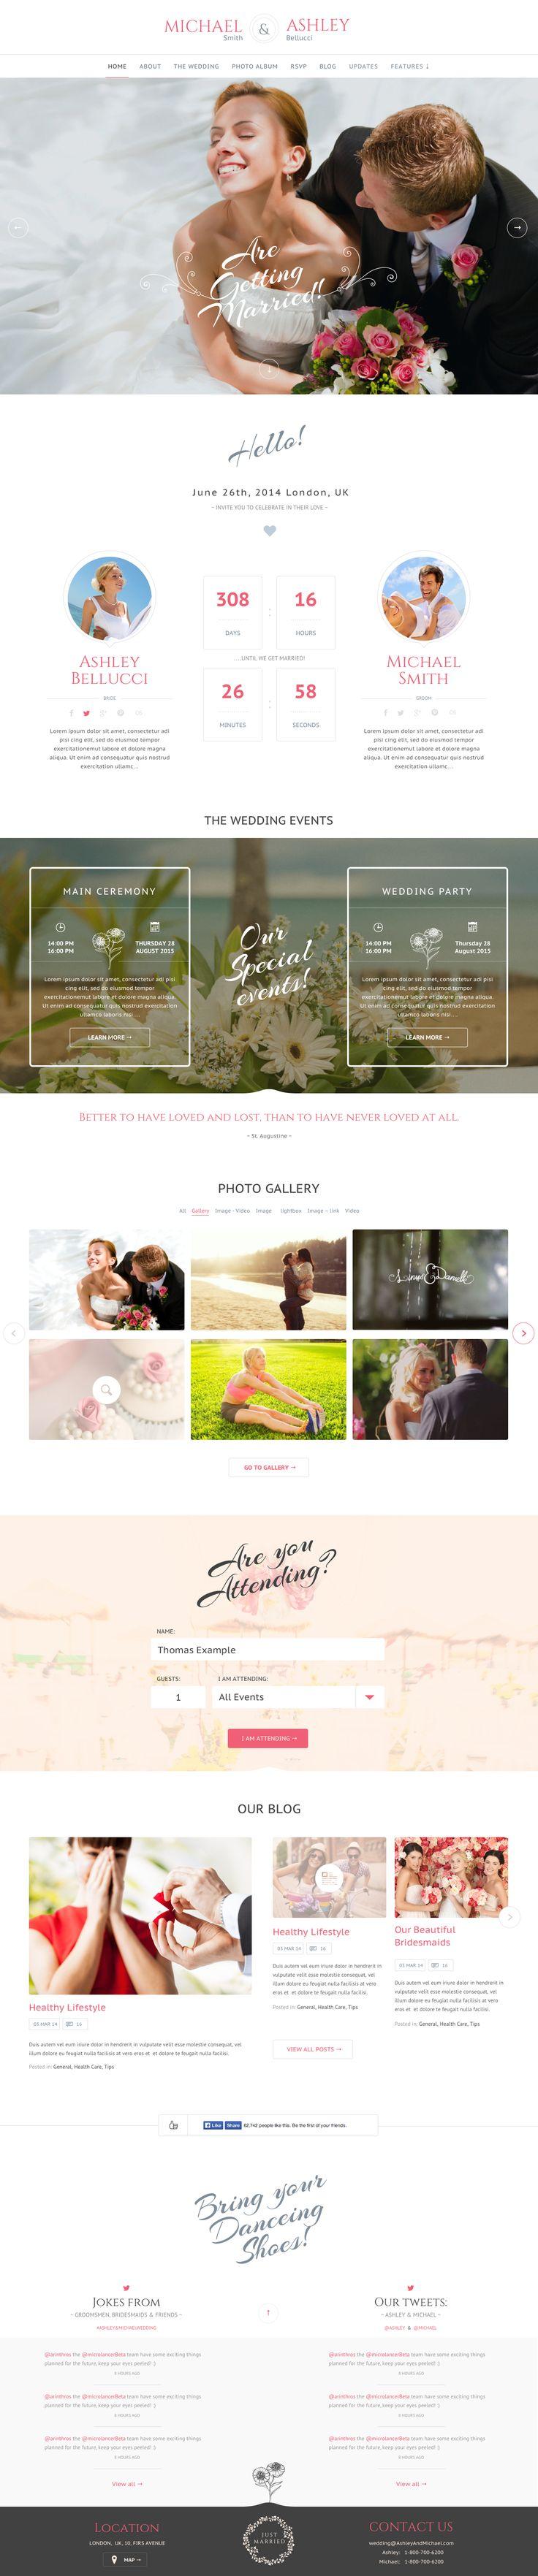 Wedding WordPress Responsive Theme | Buy and Download: http://themeforest.net/item/honeymoon-wedding-responsive-theme/8103339?WT.ac=category_thumbWT.z_author=vamtamref=ksioks